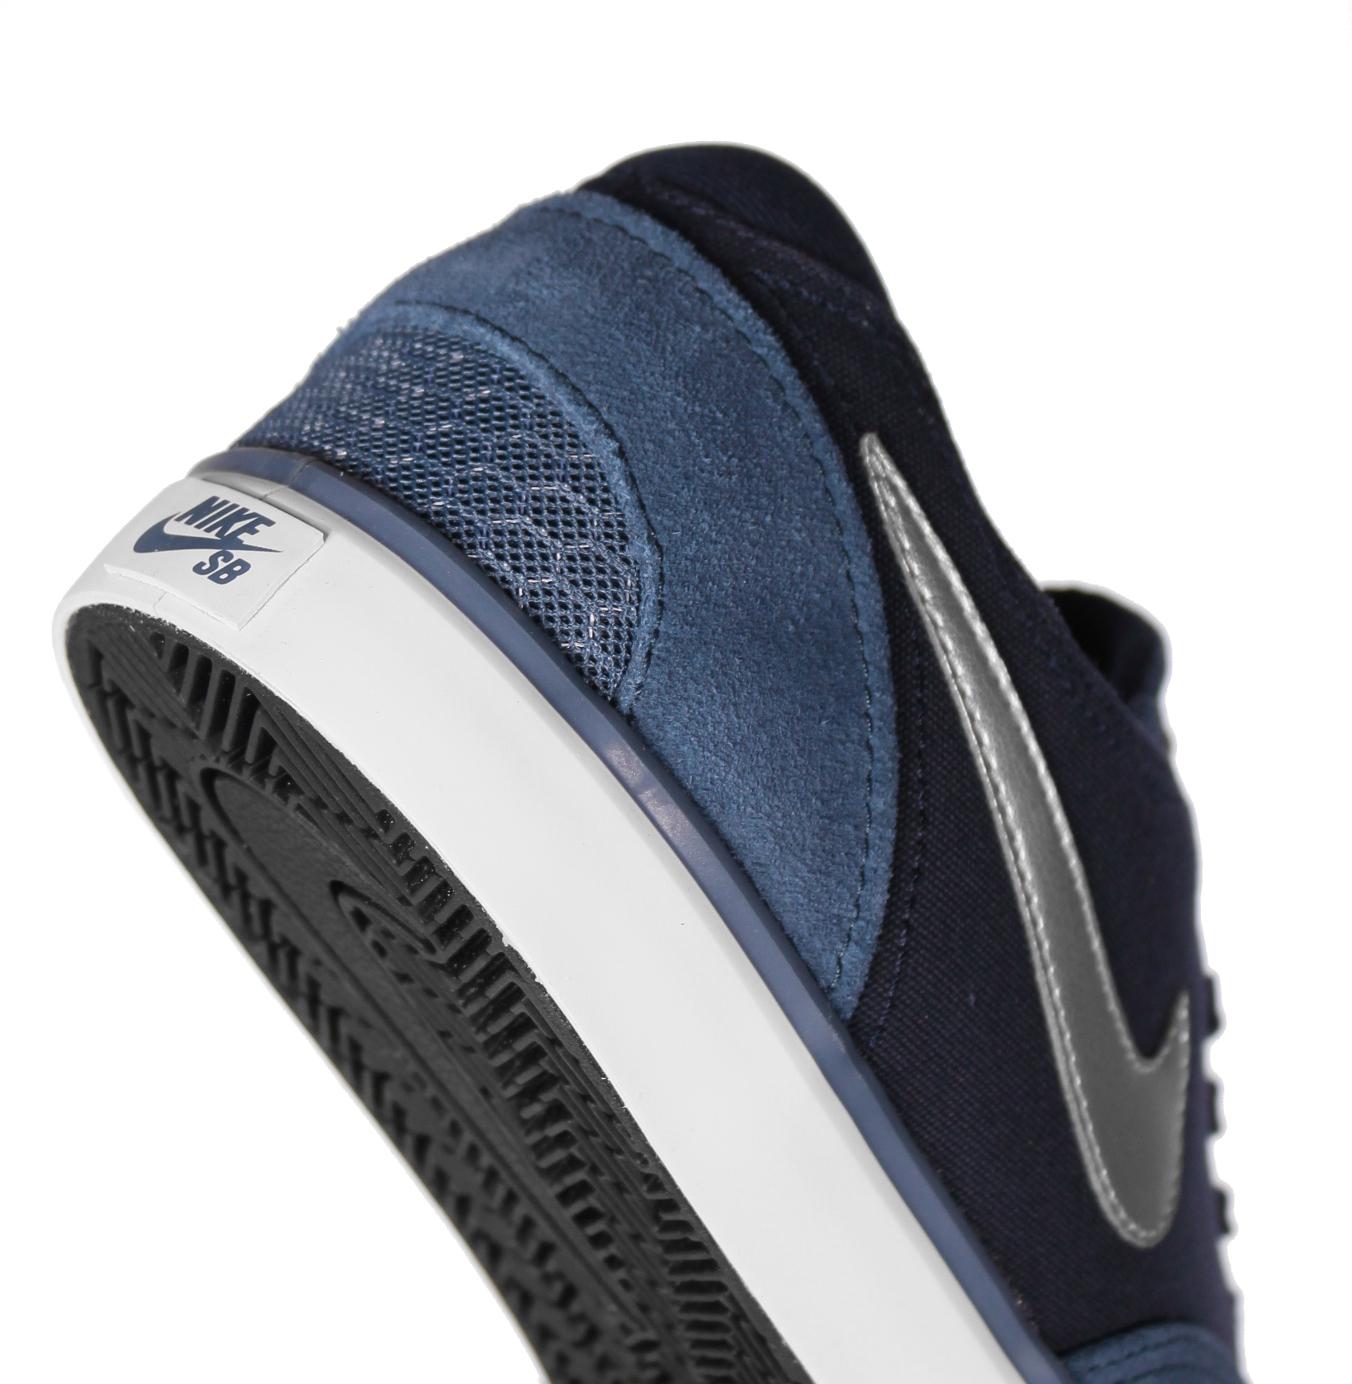 Buty Nike Sb Eric Koston 2 Lr (New Slate/Mtllc Slvr/Obsdn/Blk)